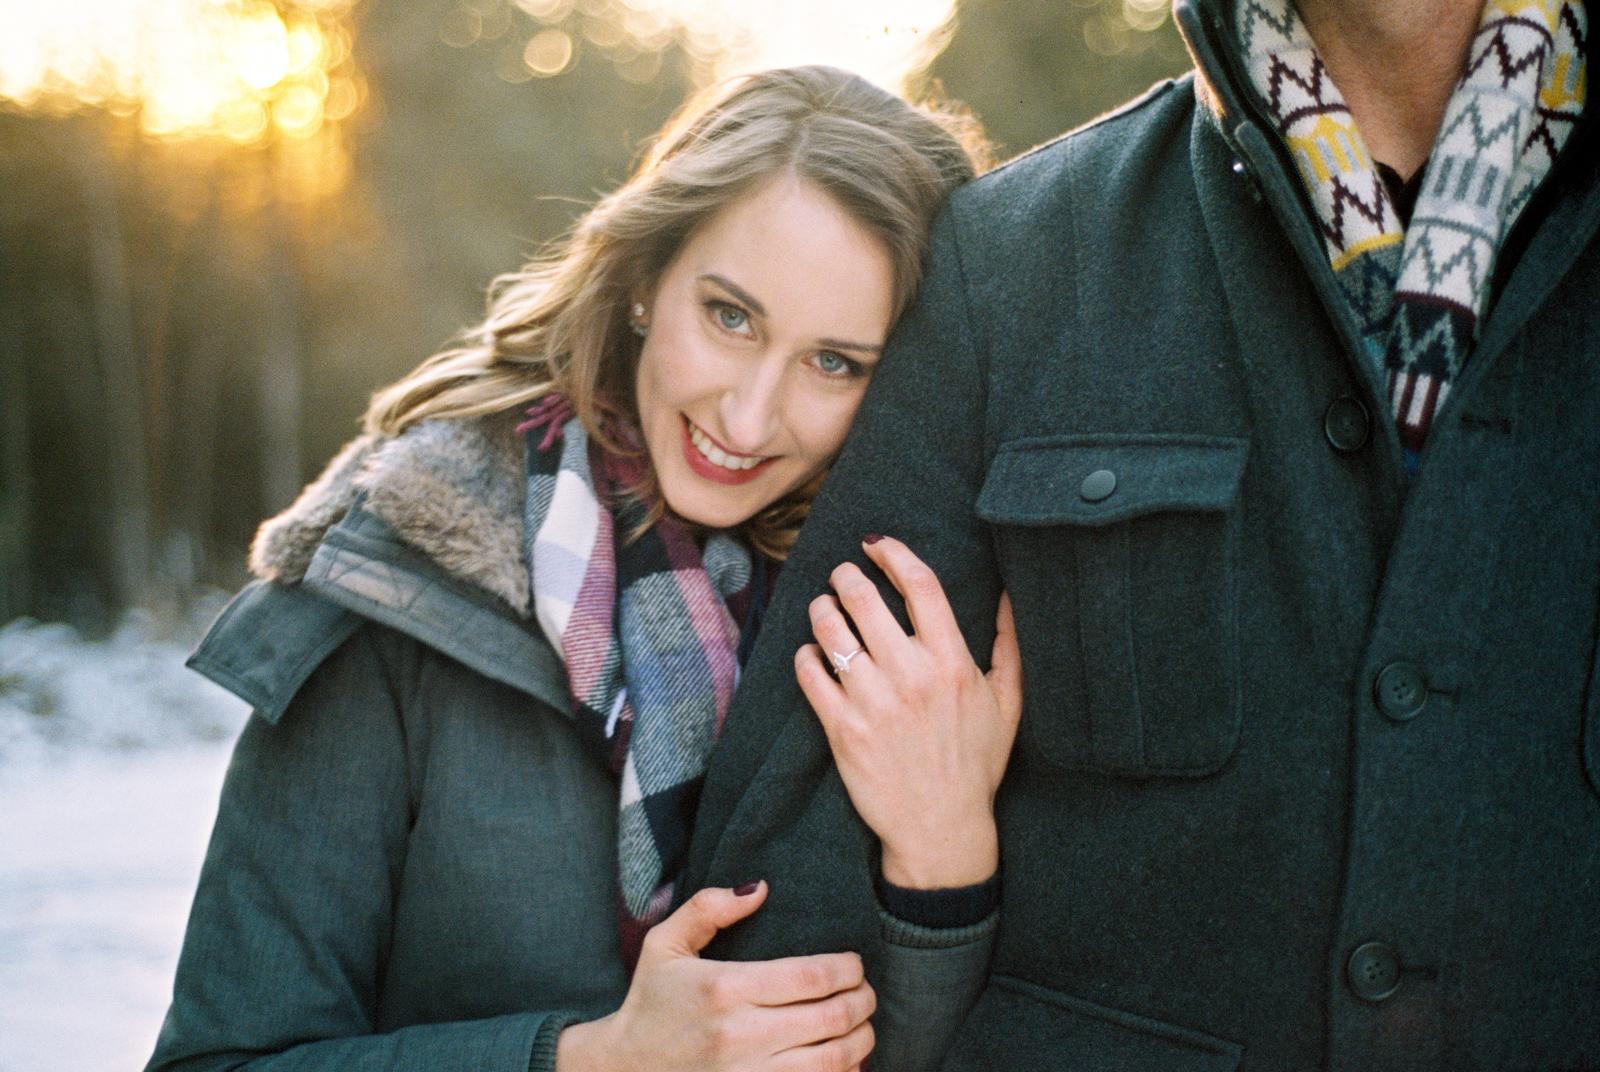 brenna-brad-ontario-engagement-28